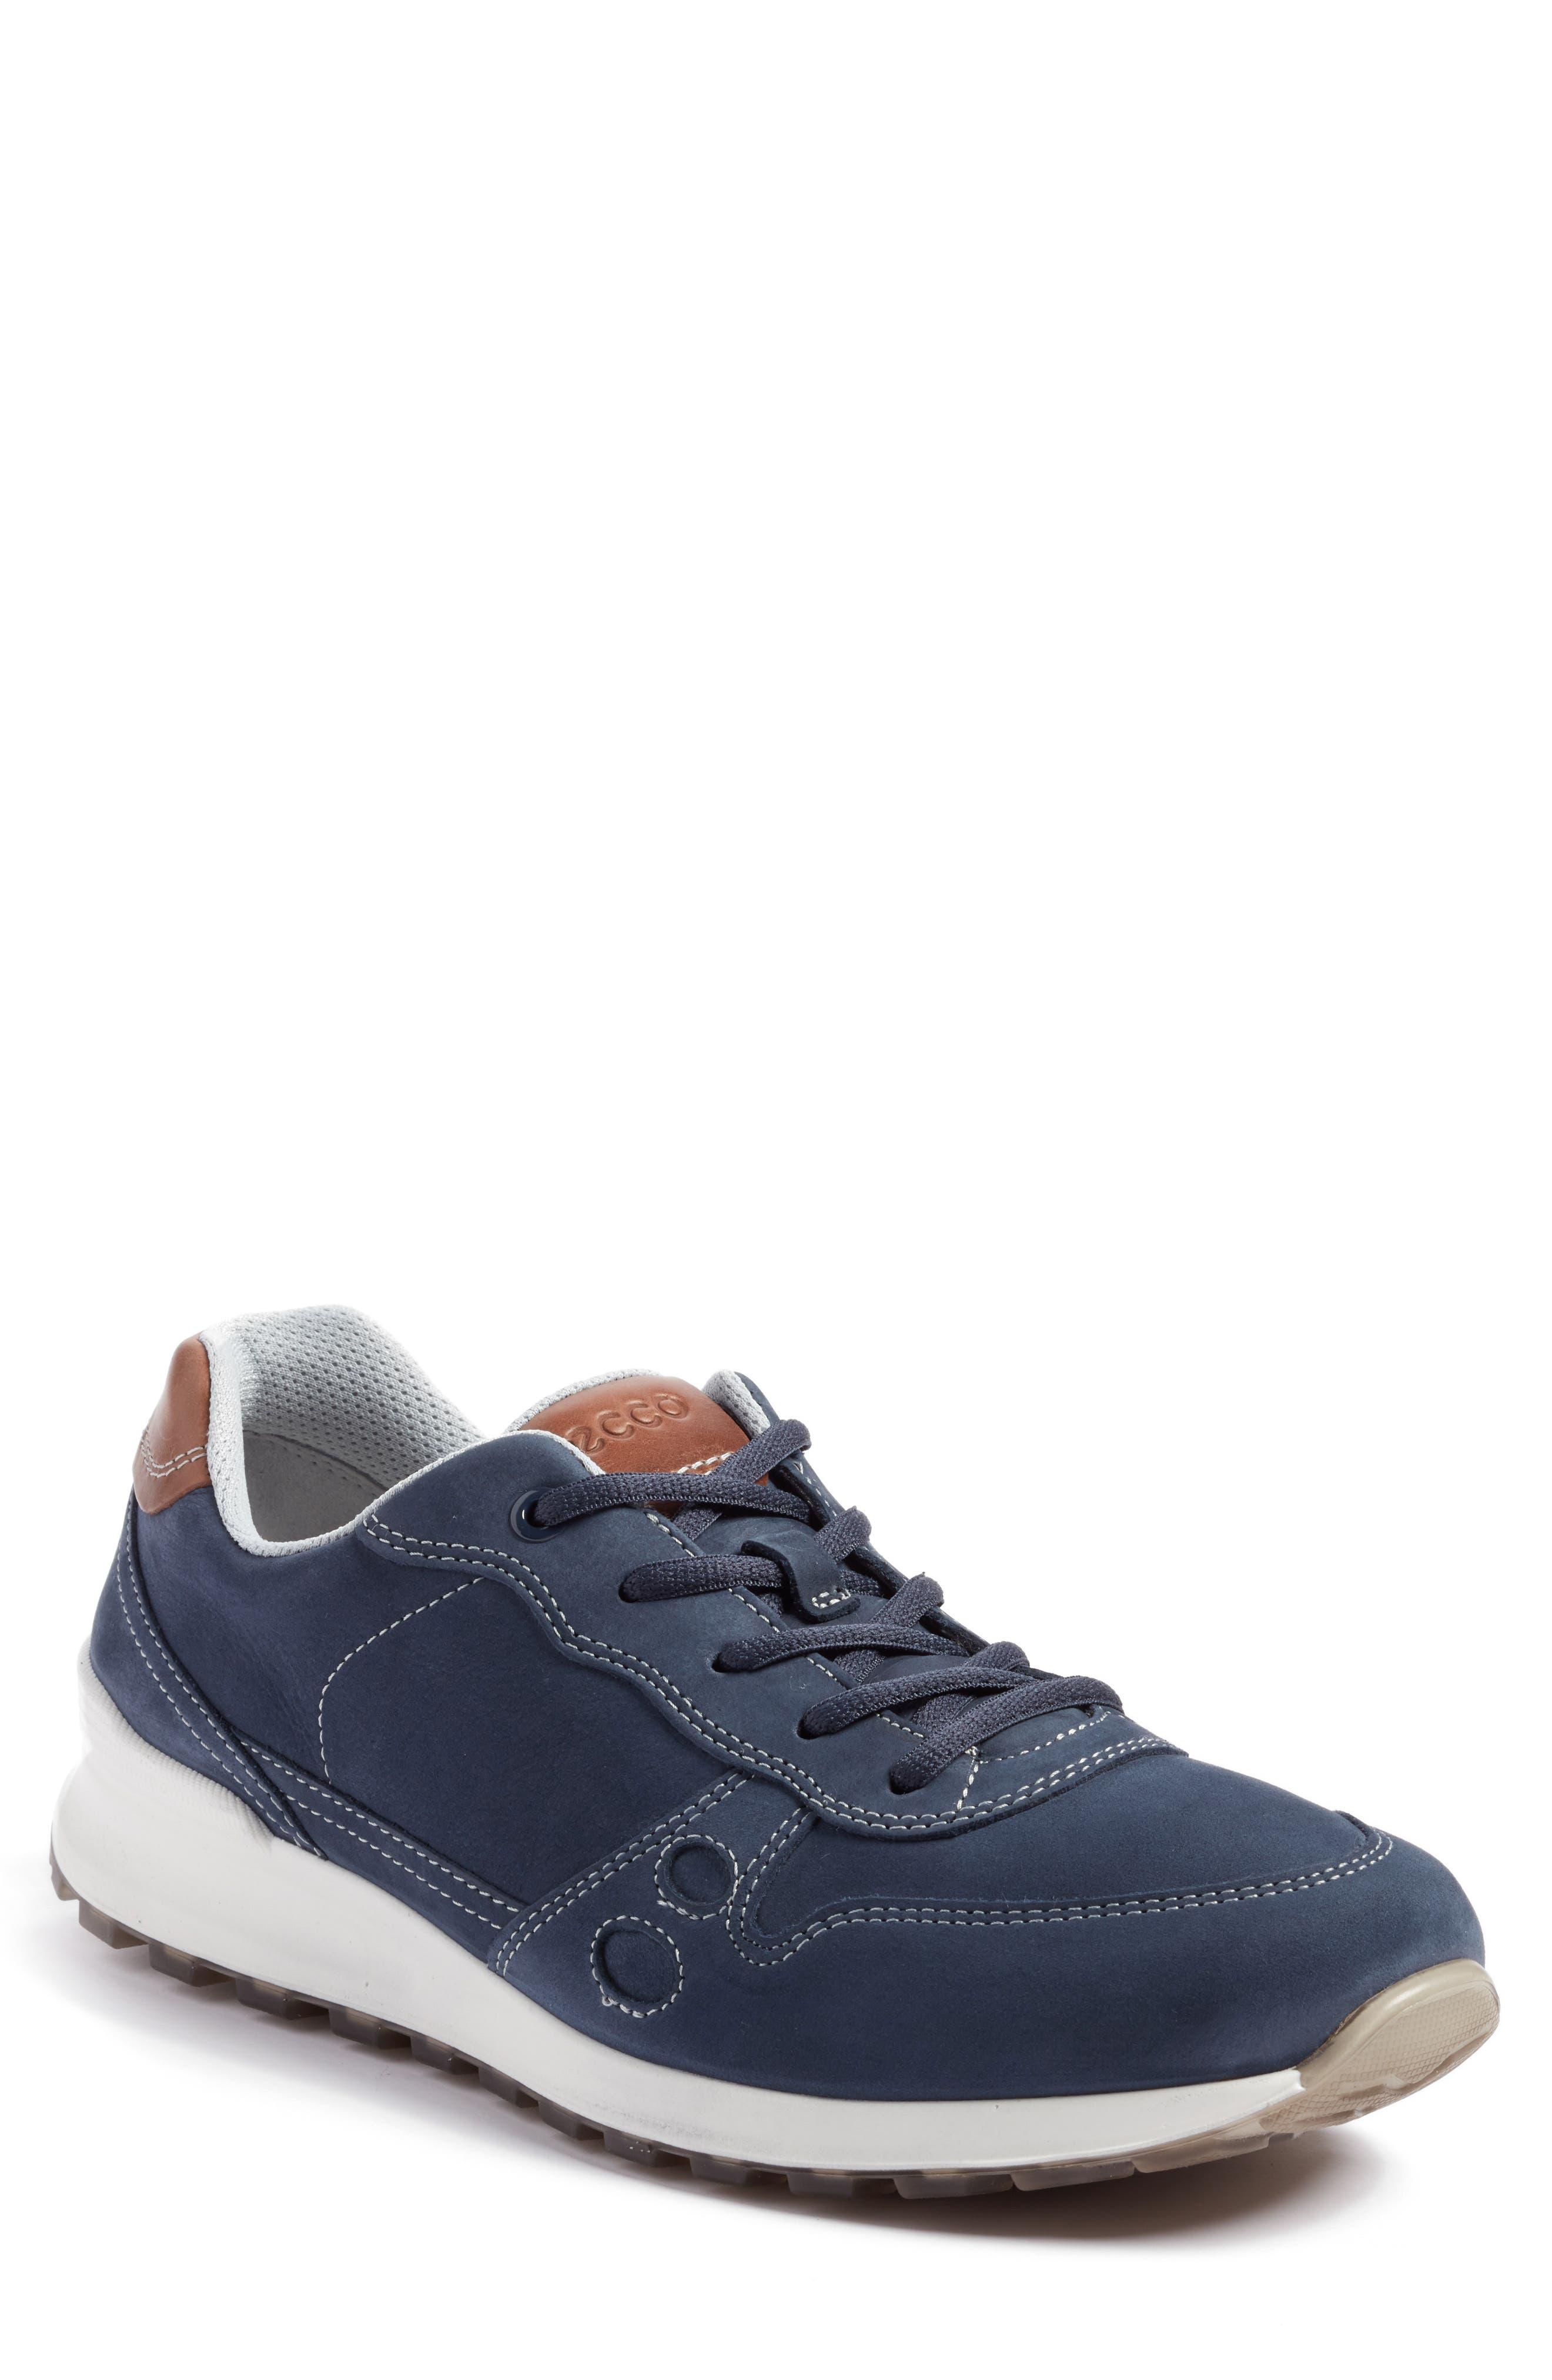 CS14 Retro Sneaker,                         Main,                         color, 408